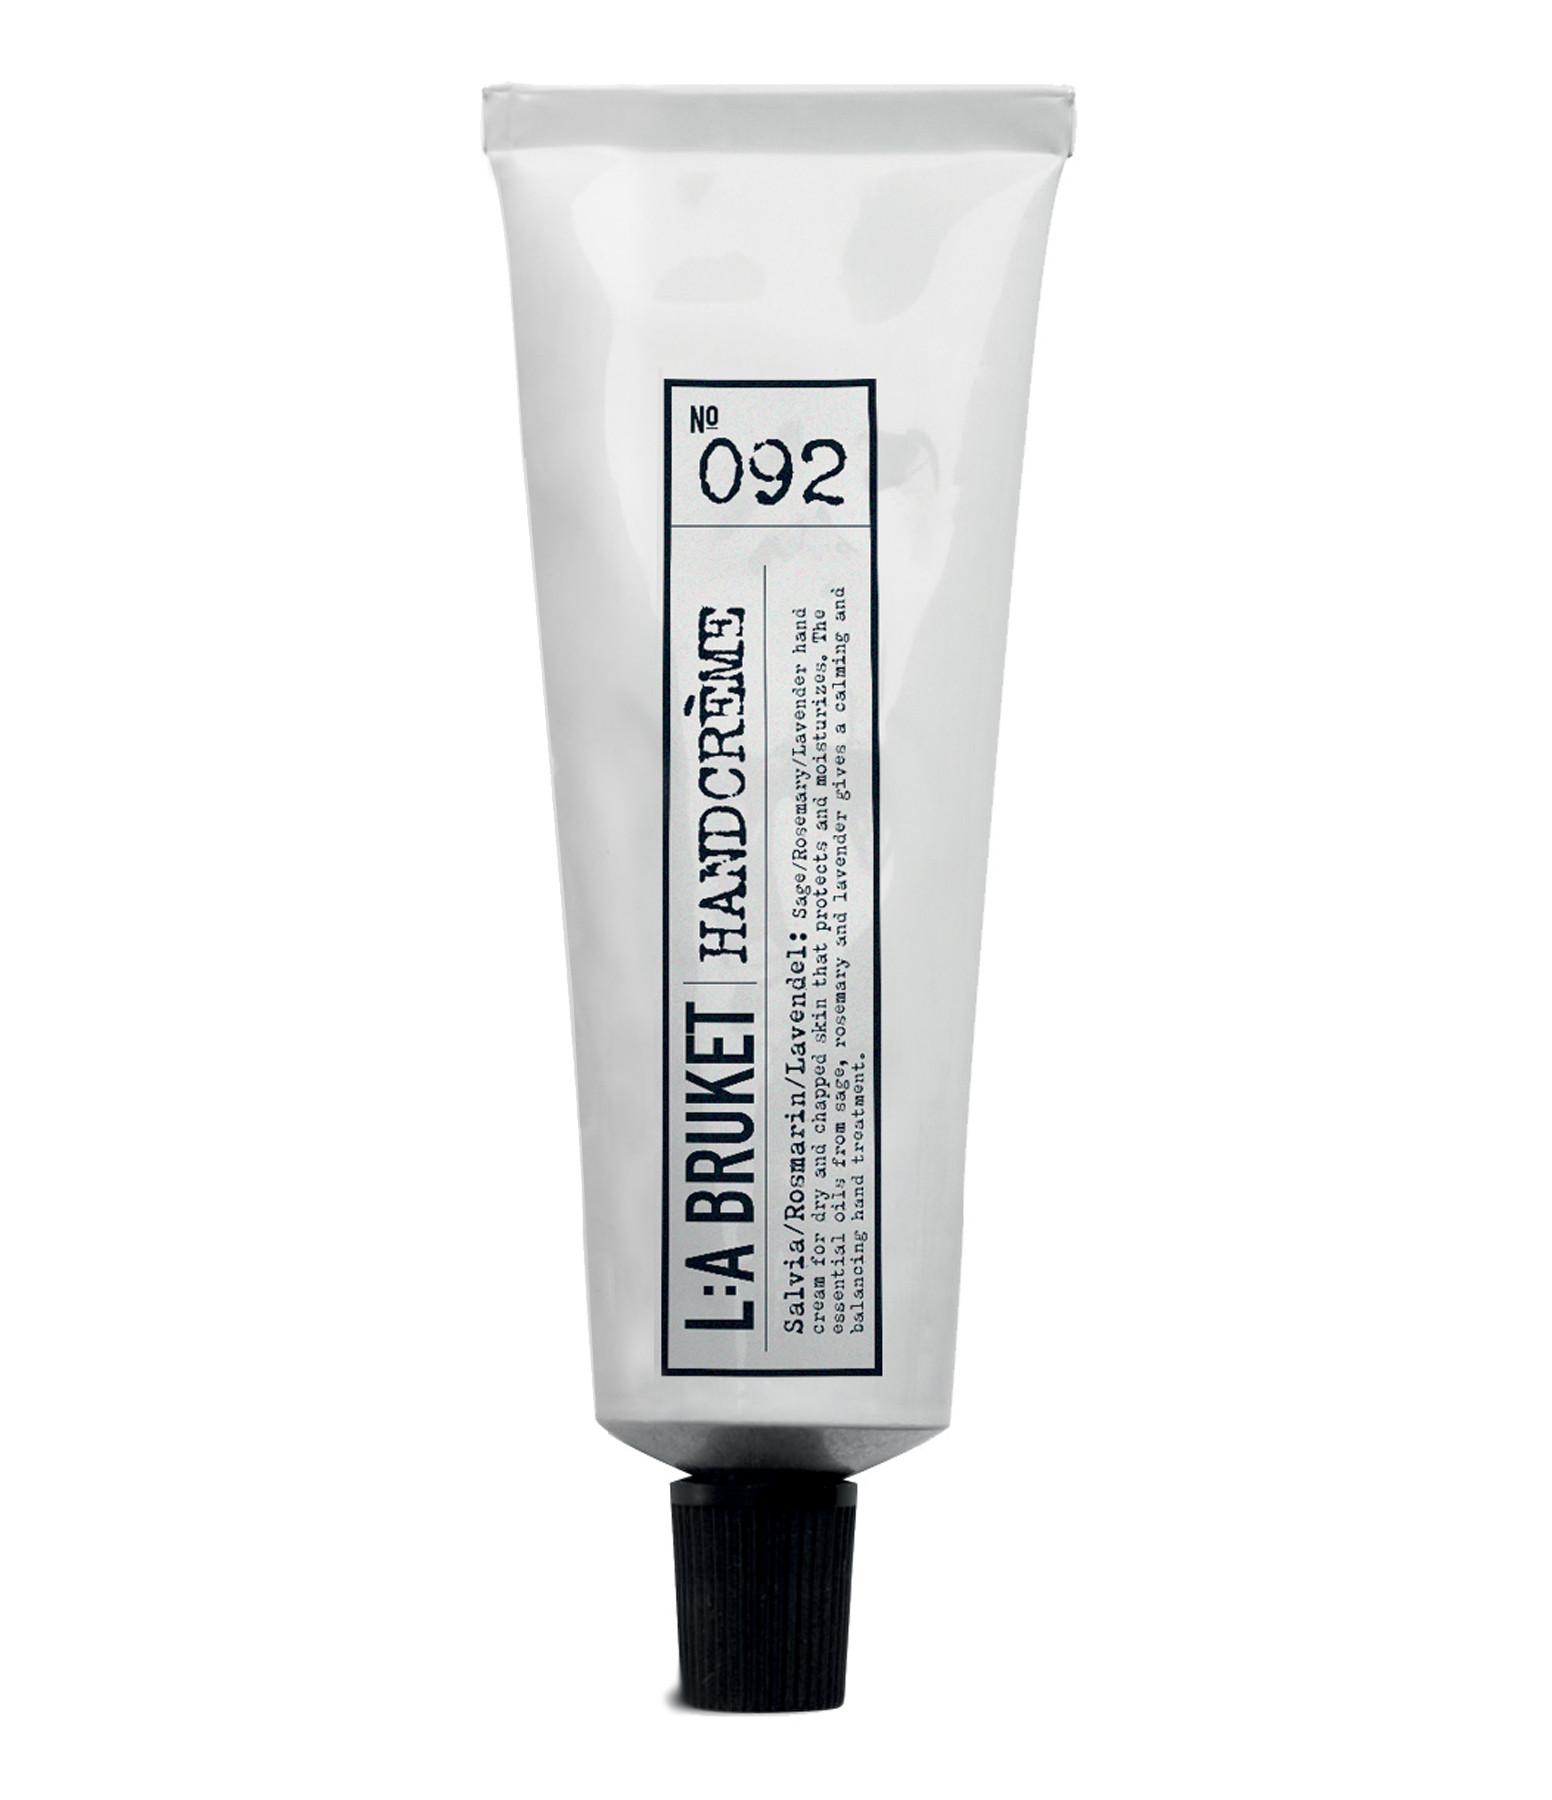 L:A BRUKET - Crème Mains Sauge Romarin Lavande 30ml N°092